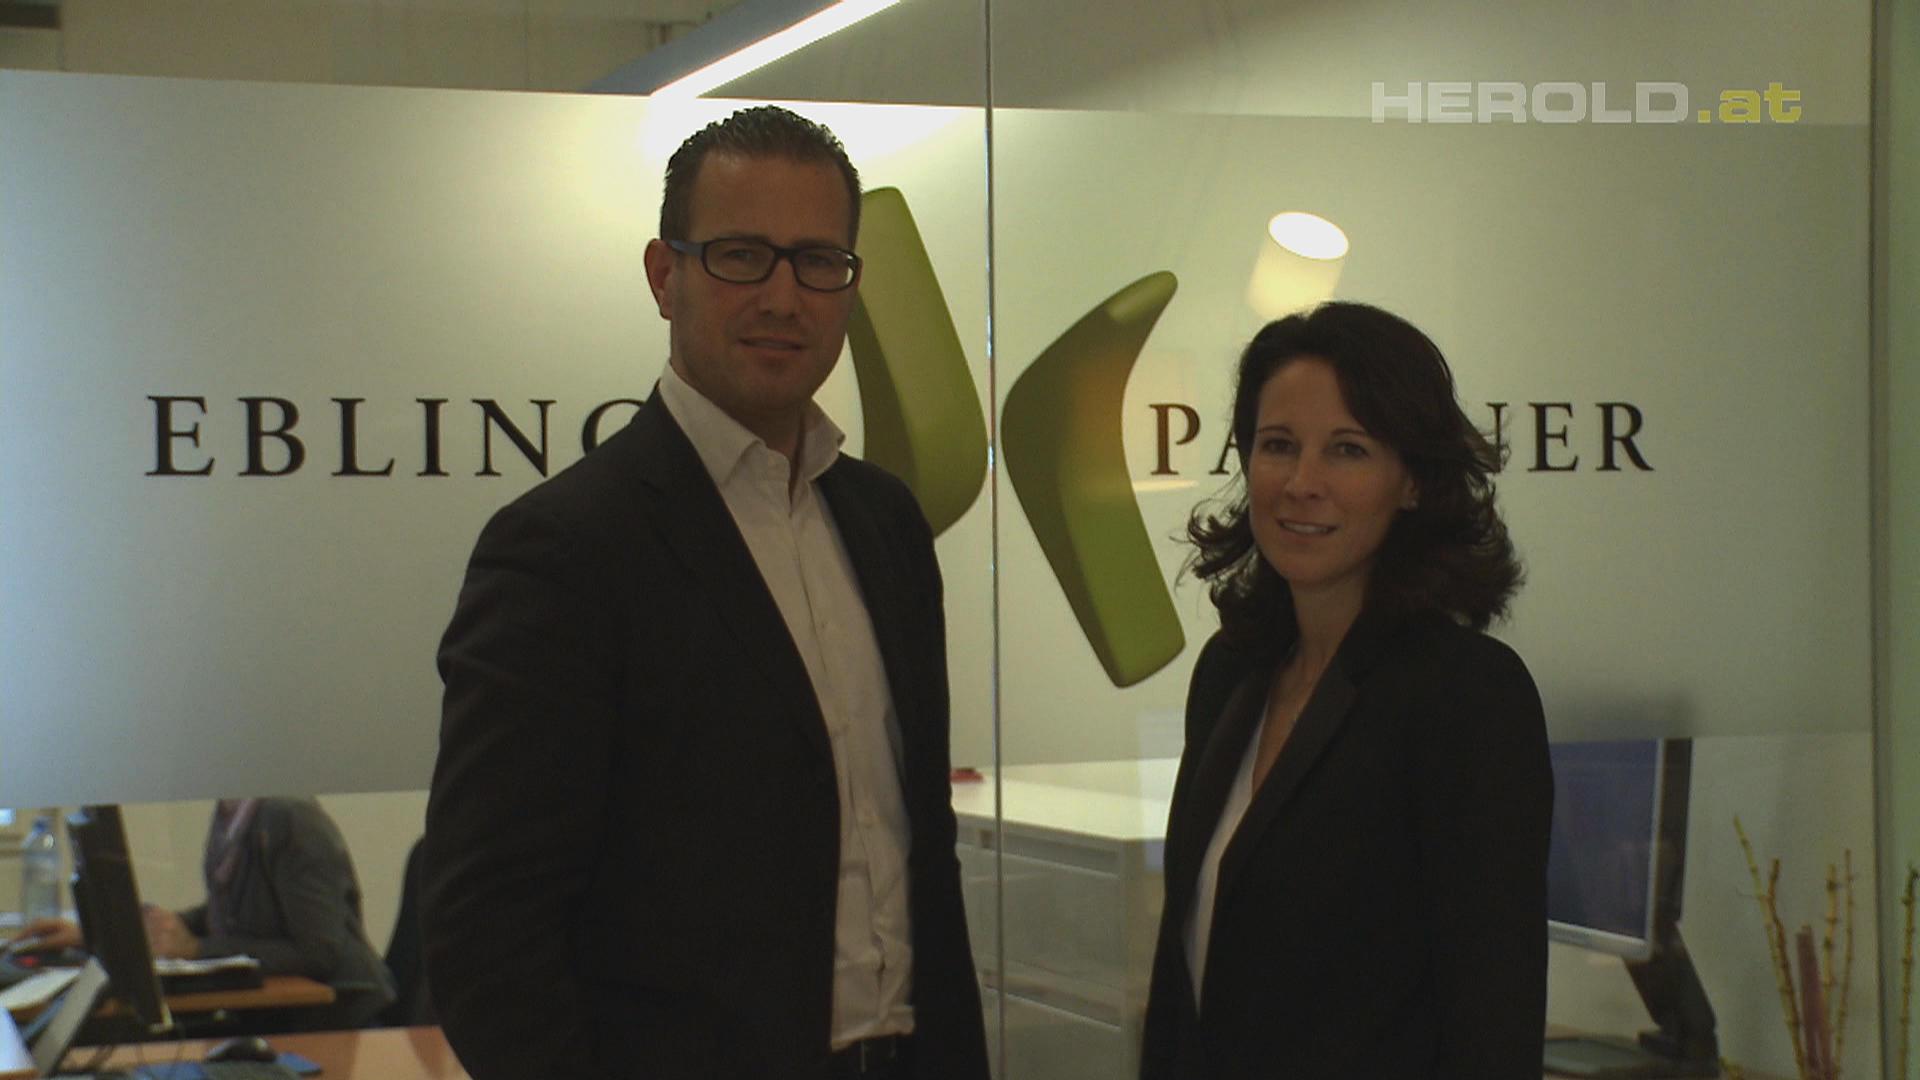 Eblinger & Partner Personal- u Managementberatungs GmbH